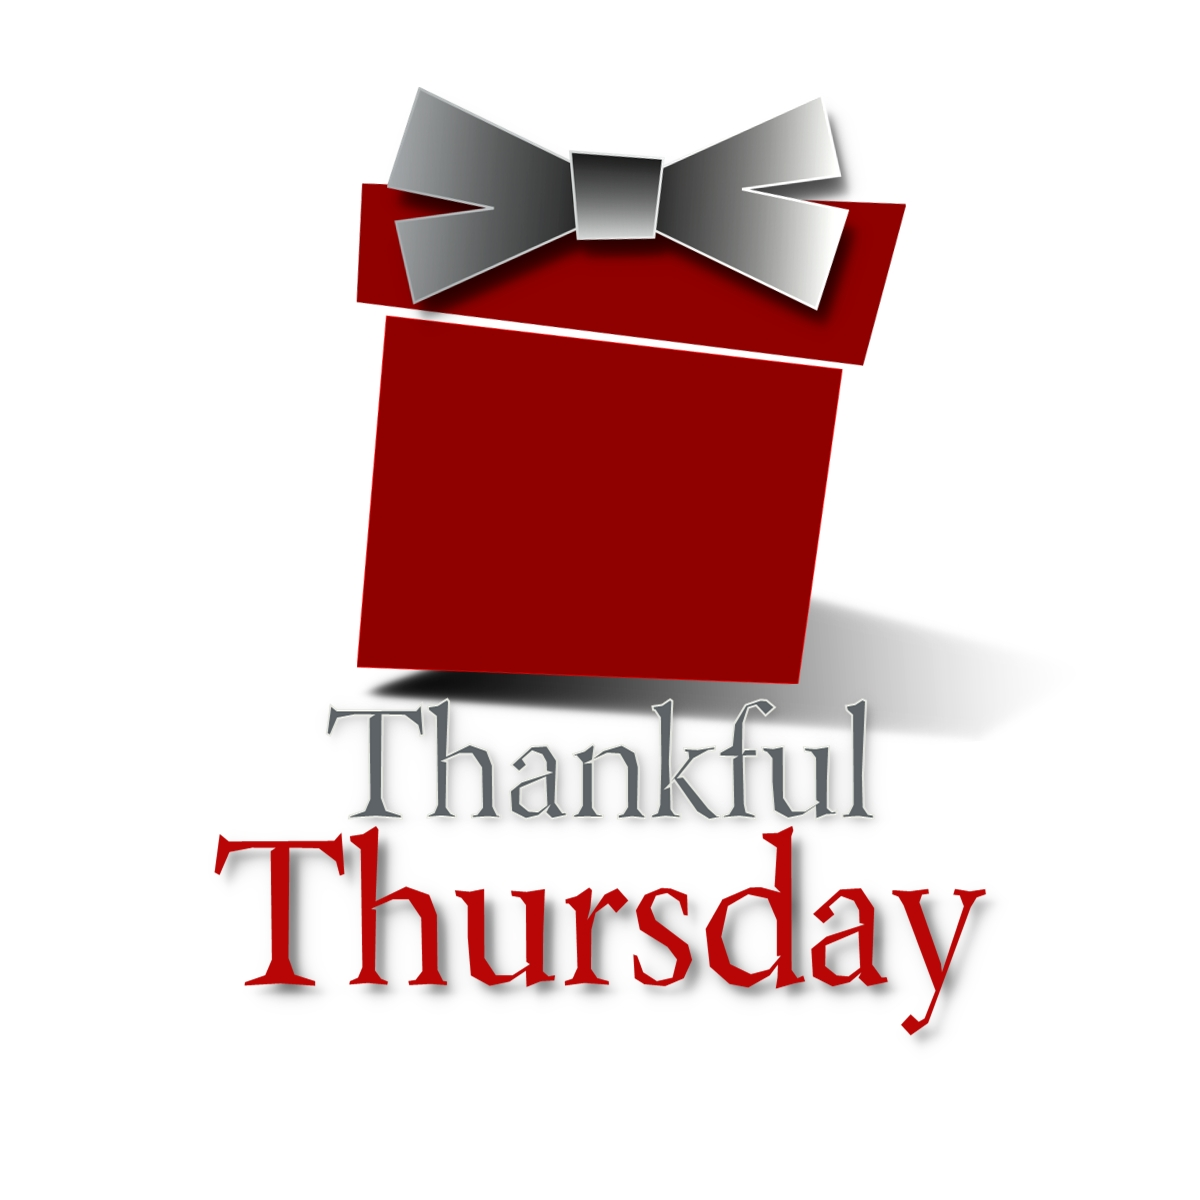 Thankful ThursdayThursday Word